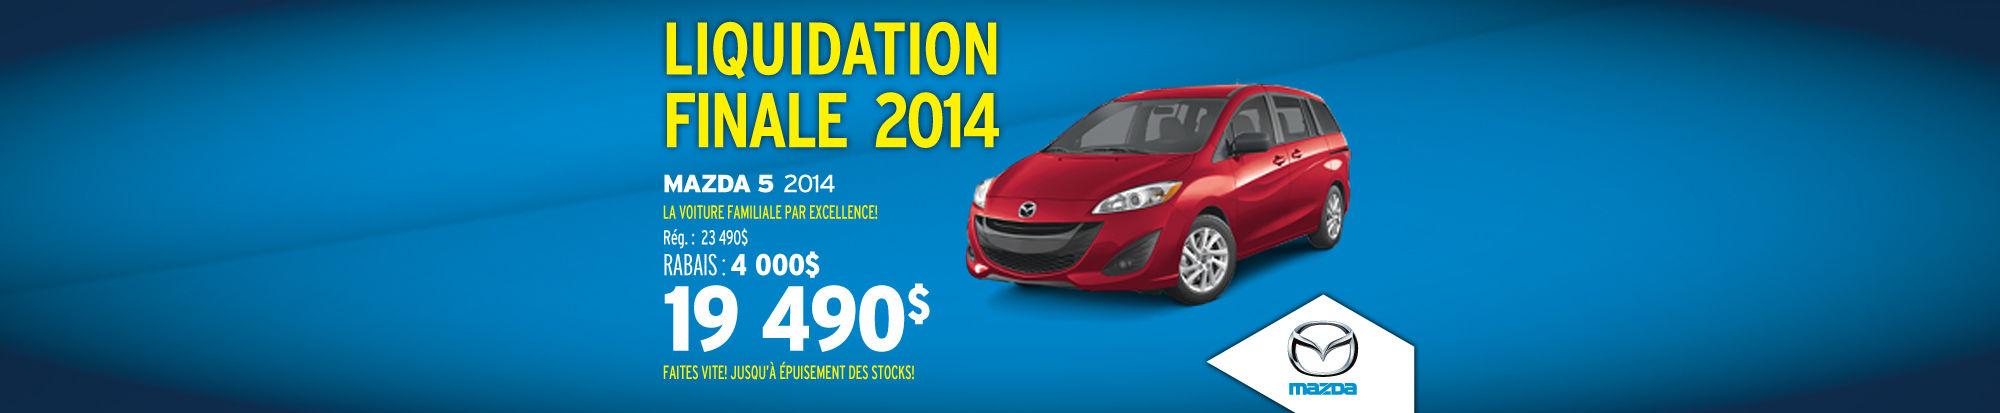 Mazda5 2014 liquidation